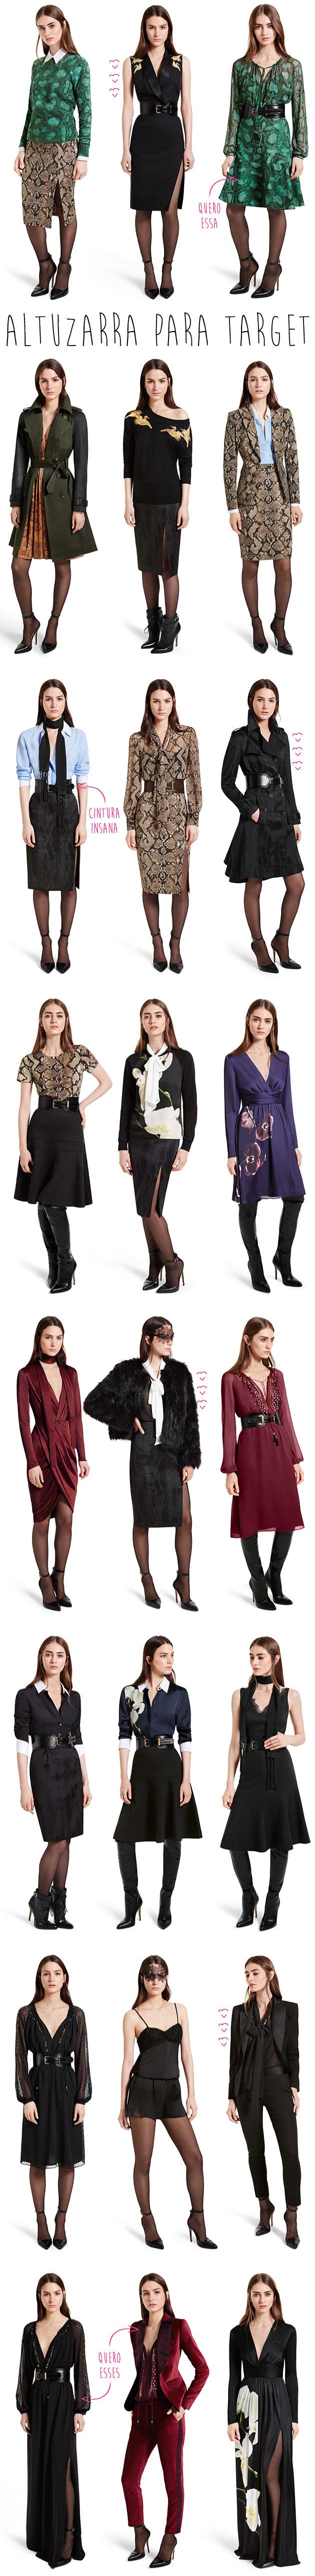 altuzarra-para-target-colecao-completa-vestido-estampa-net-a-porter-entrega-brasil-compra-online-